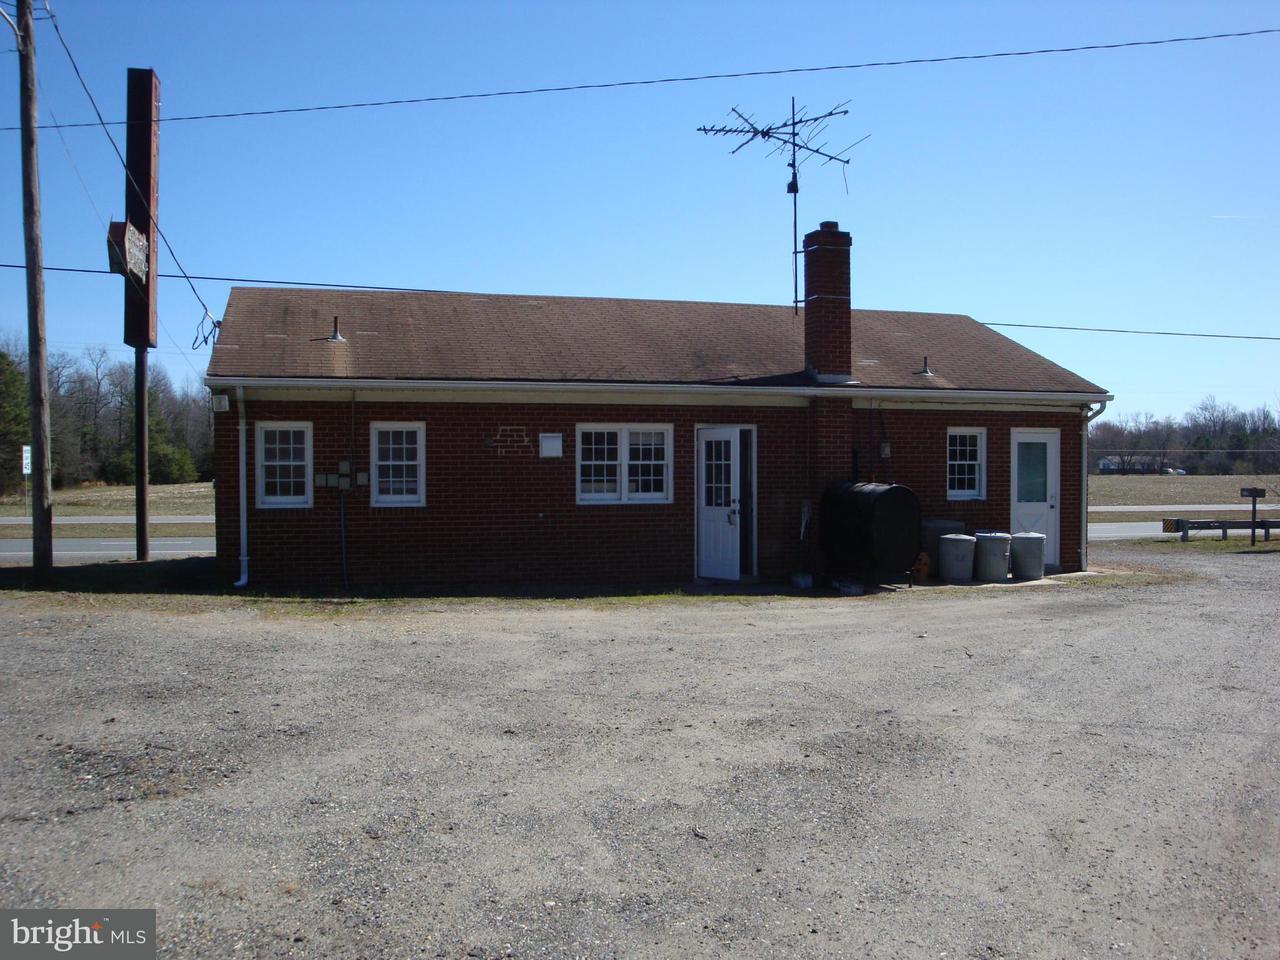 Additional photo for property listing at 13132 JAMES MADISON PKWY 13132 JAMES MADISON PKWY King George, Βιρτζινια 22485 Ηνωμενεσ Πολιτειεσ